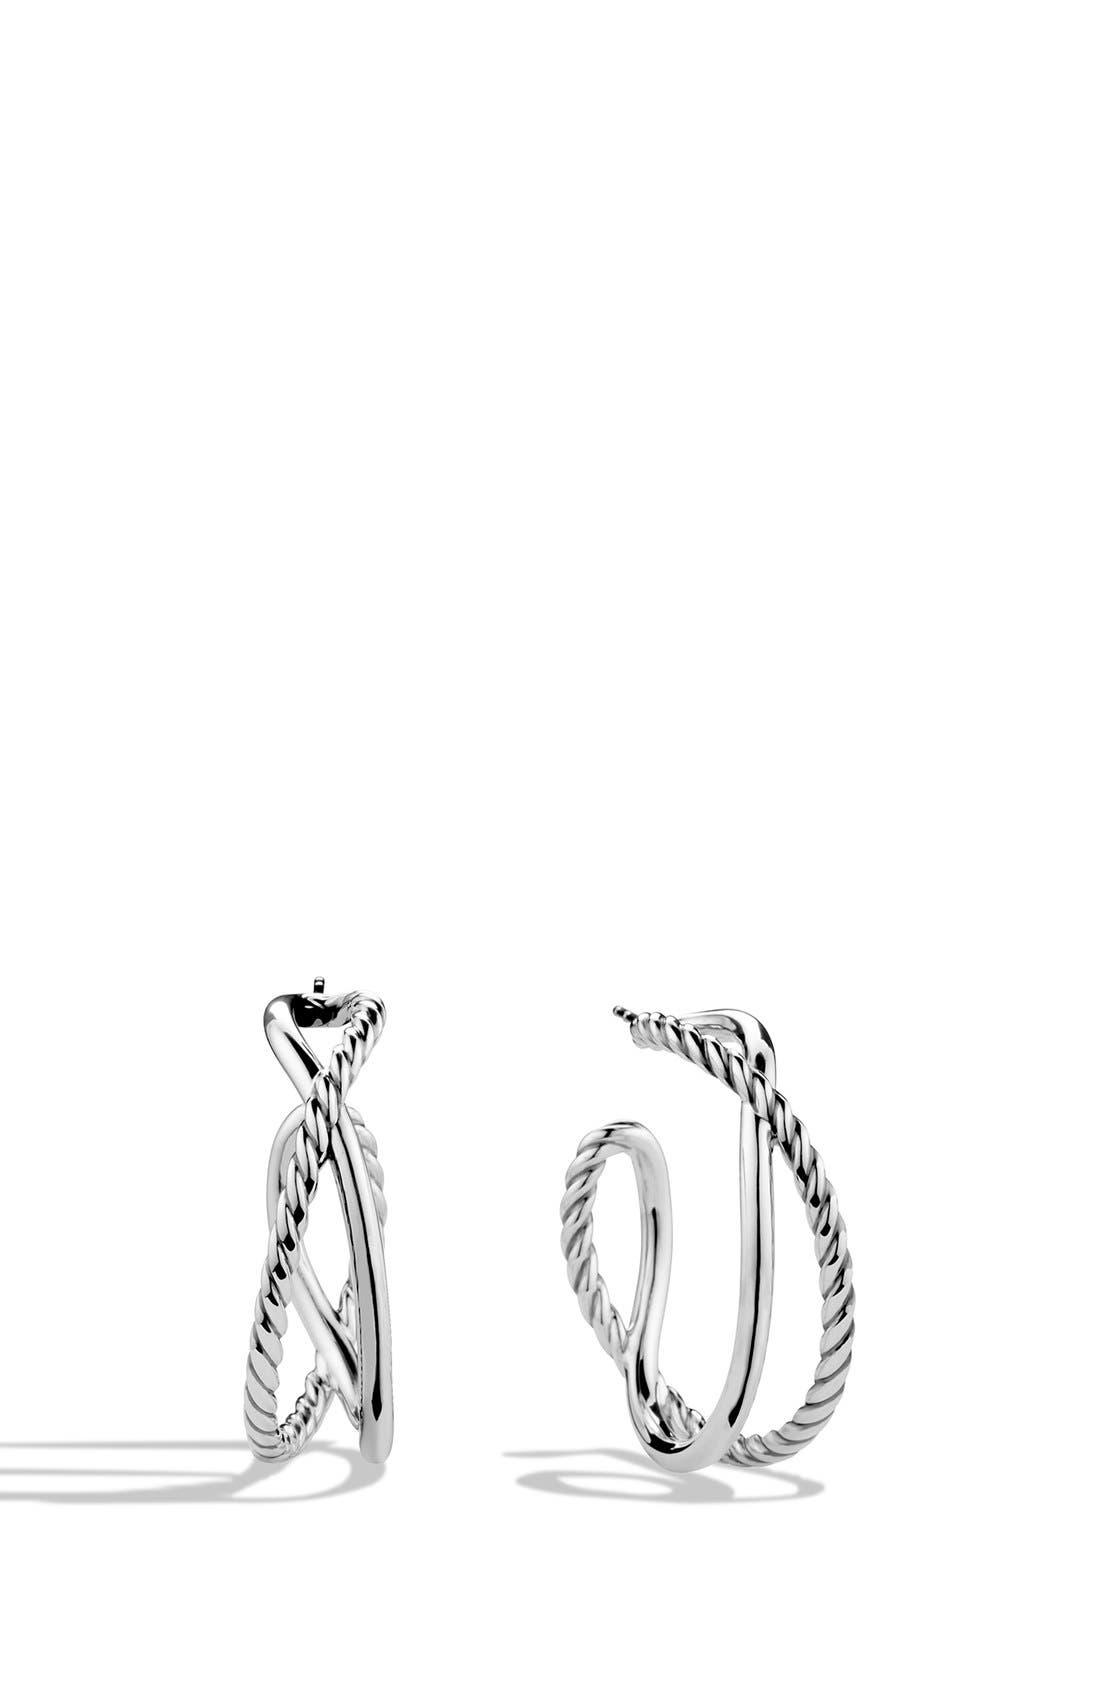 Main Image - David Yurman 'Crossover' Hoop Earrings